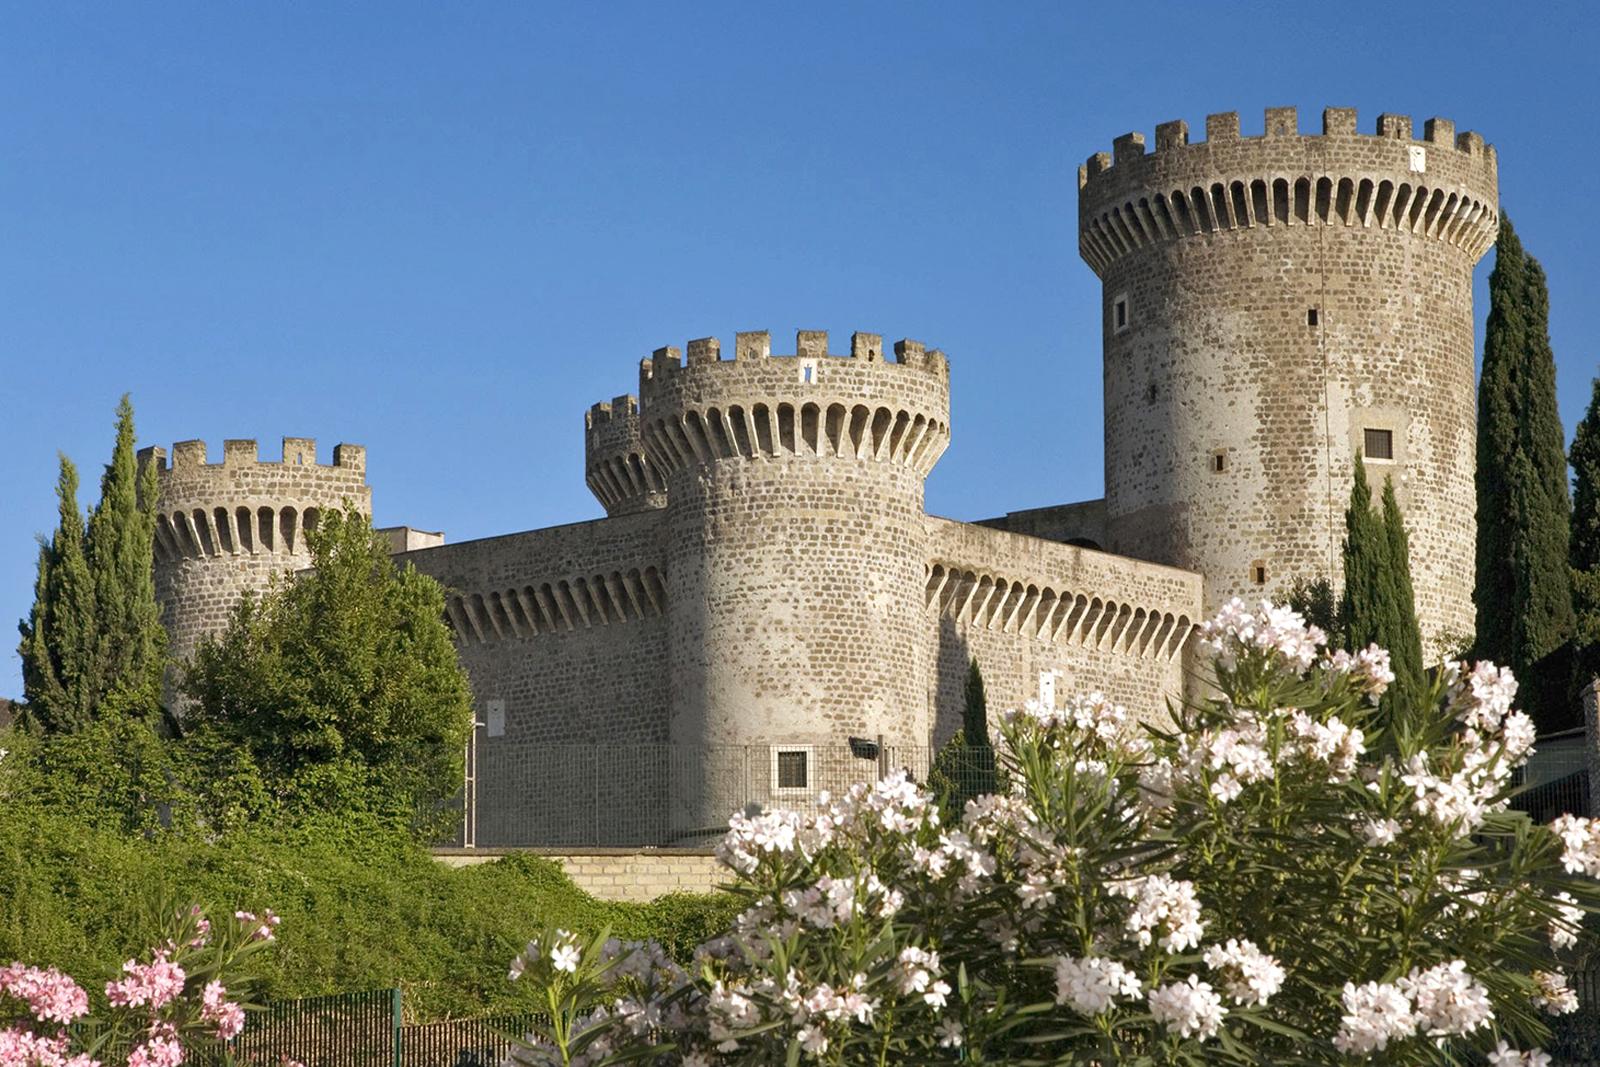 Tivoli, Rocca Pia